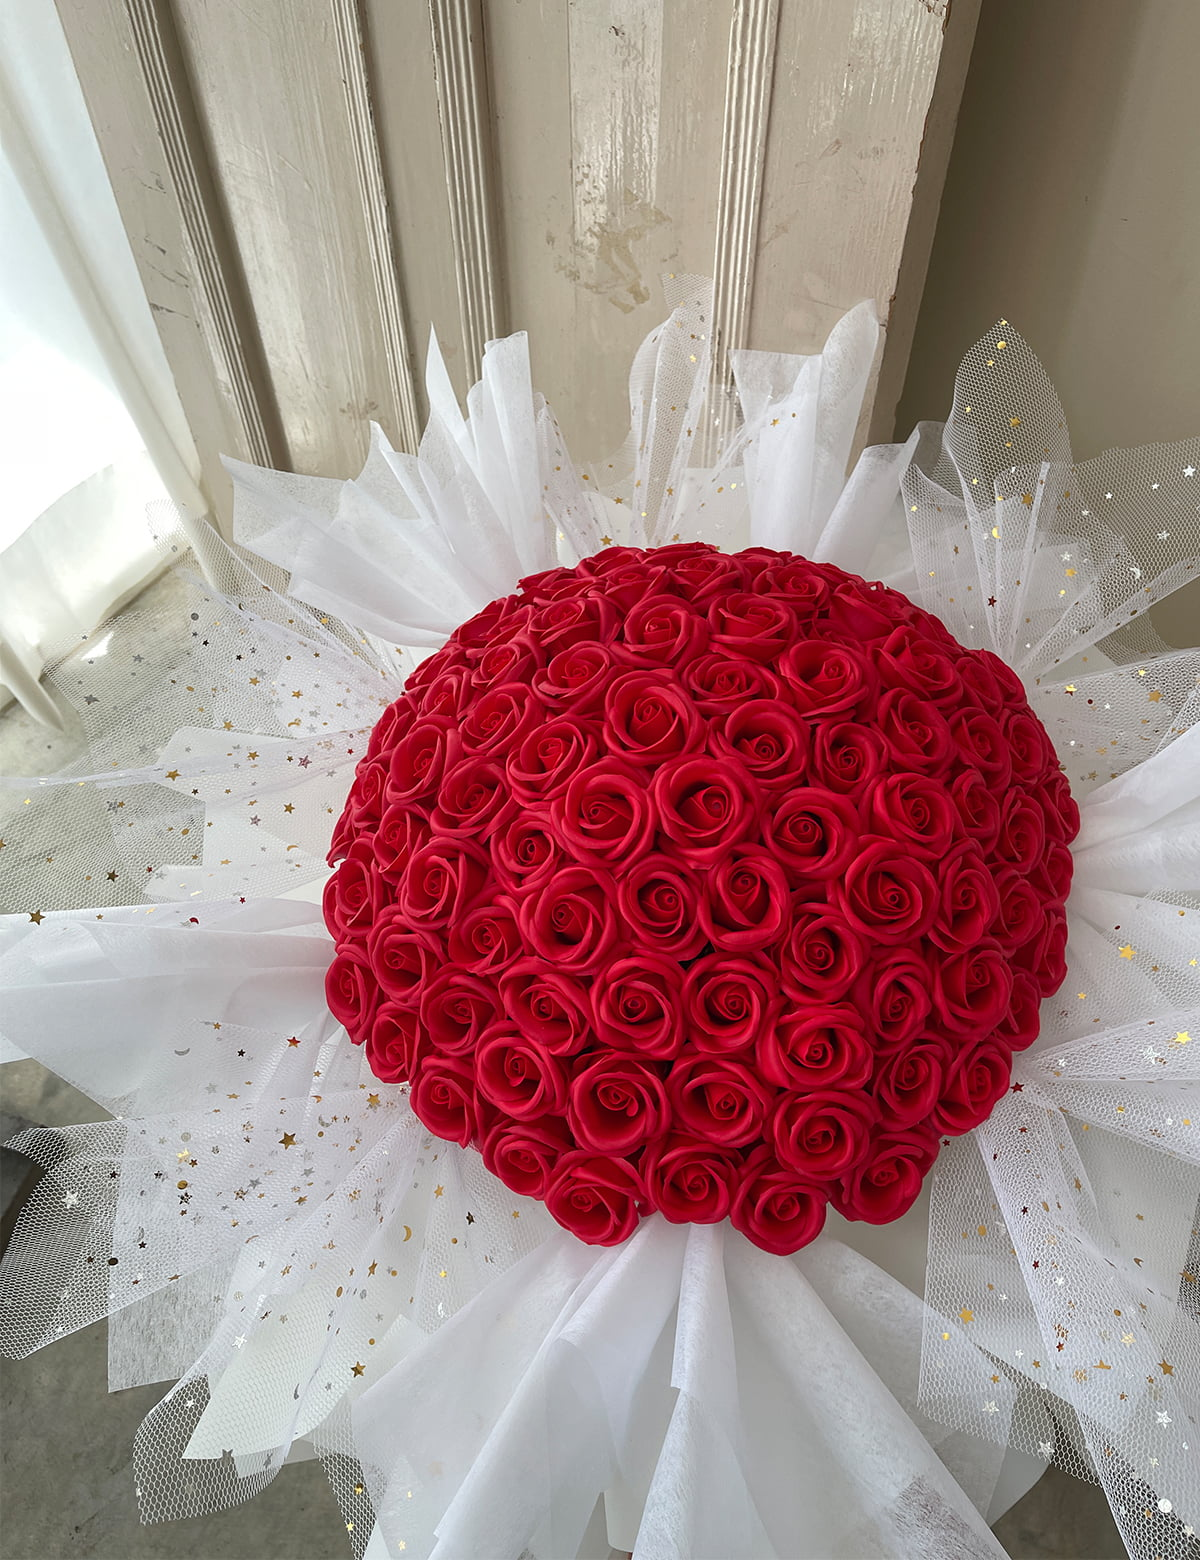 99stalks roses bouquet